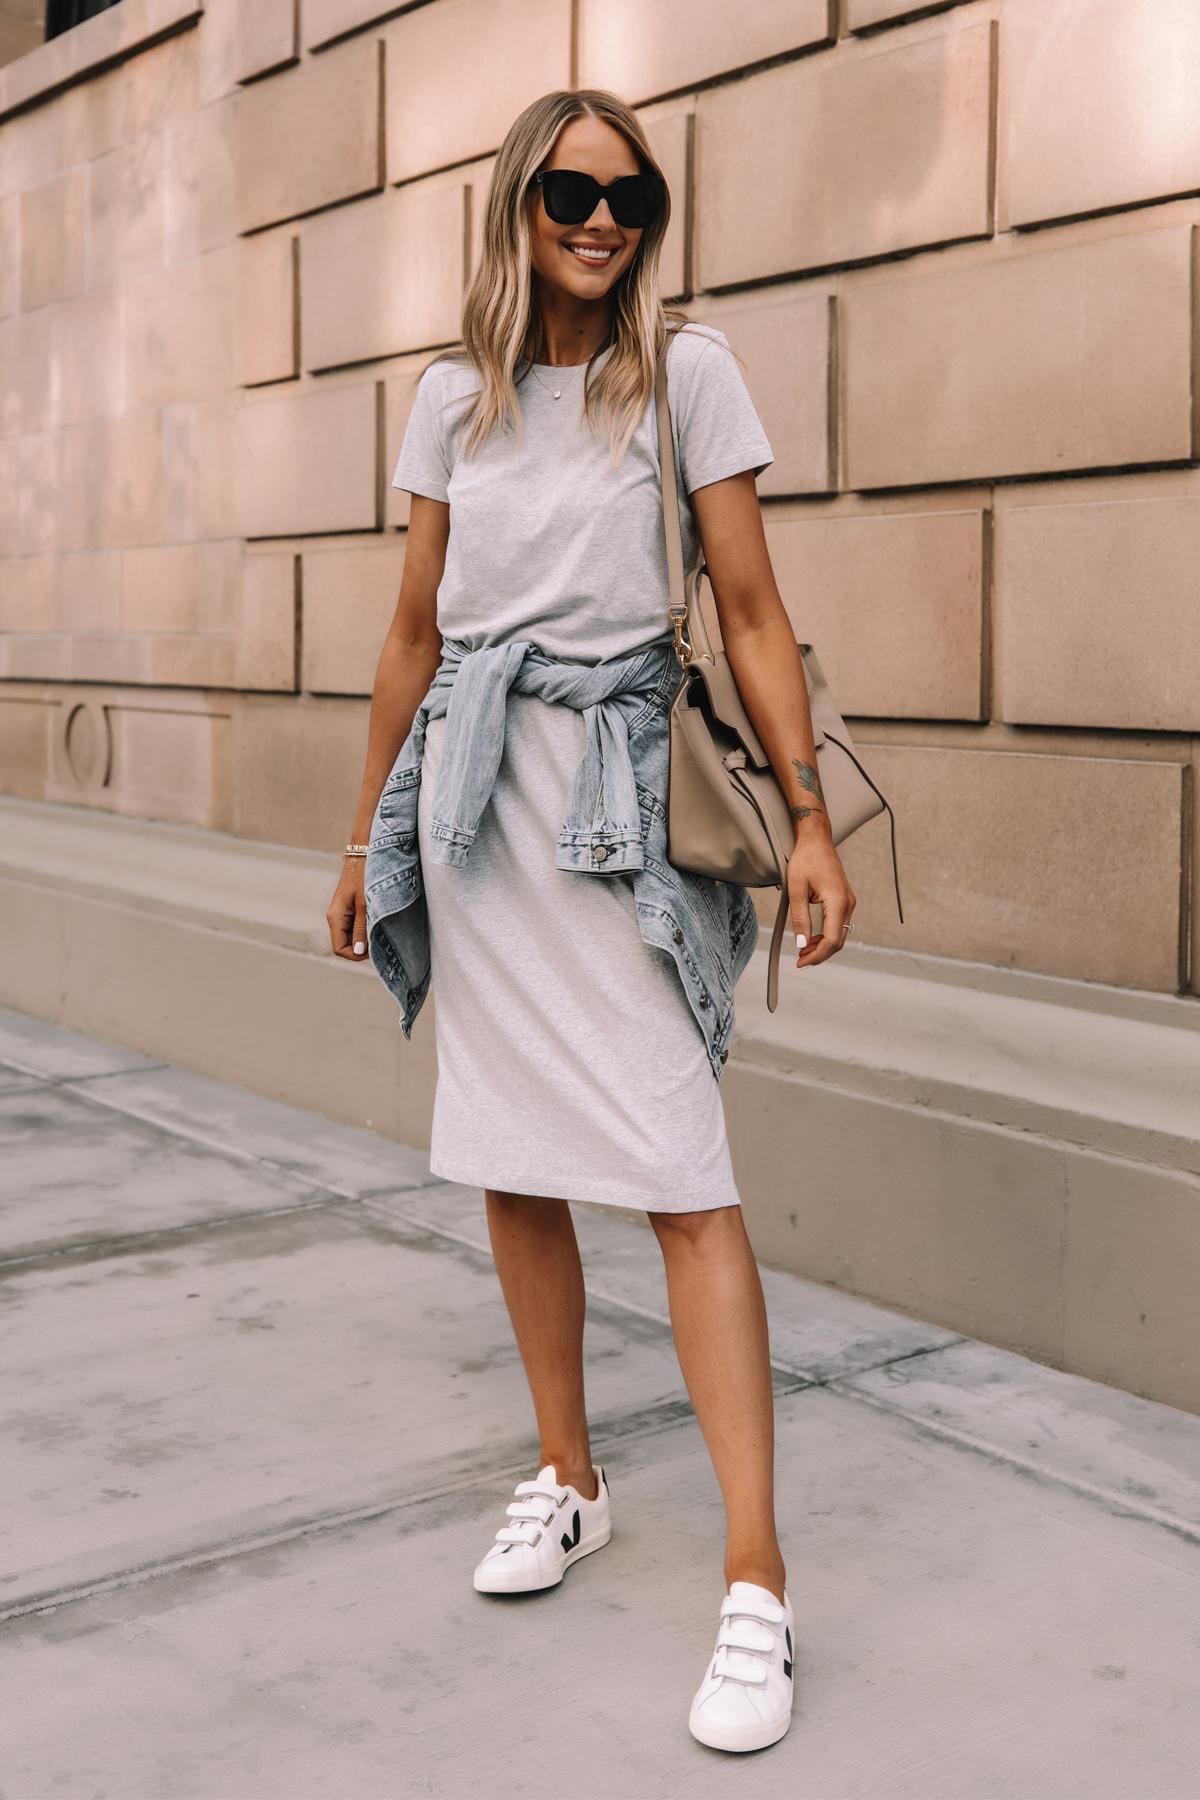 Fashion Jackson Wearing Jcrew Grey Midi Tshirt Dress Denim Jacket Veja Velcro Sneakers Celine Belt Bag Street Style Summer Outfit